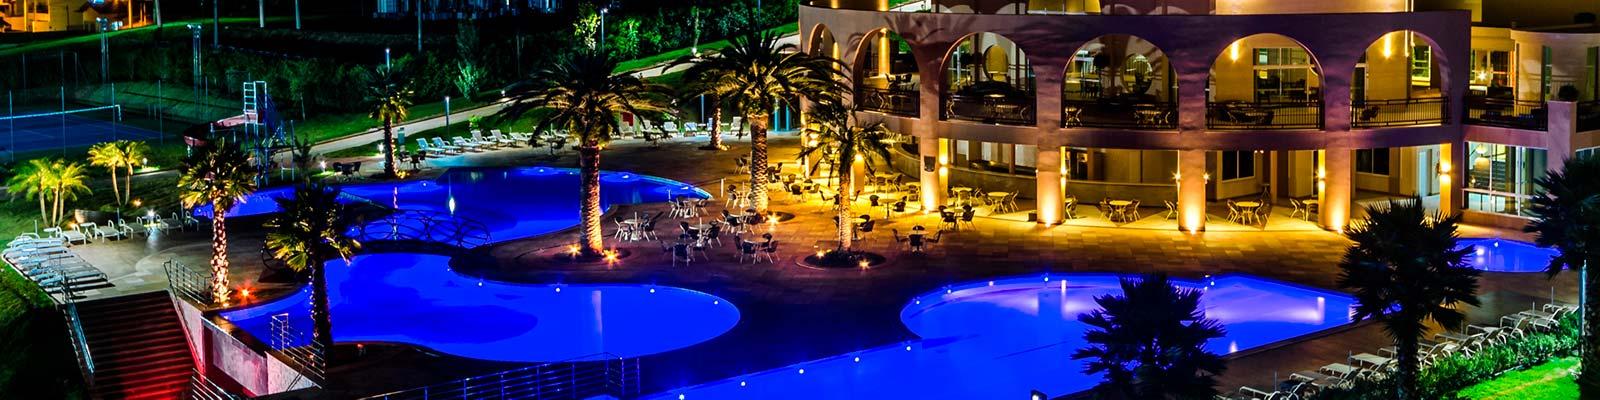 Mira Serra Parque Hotel